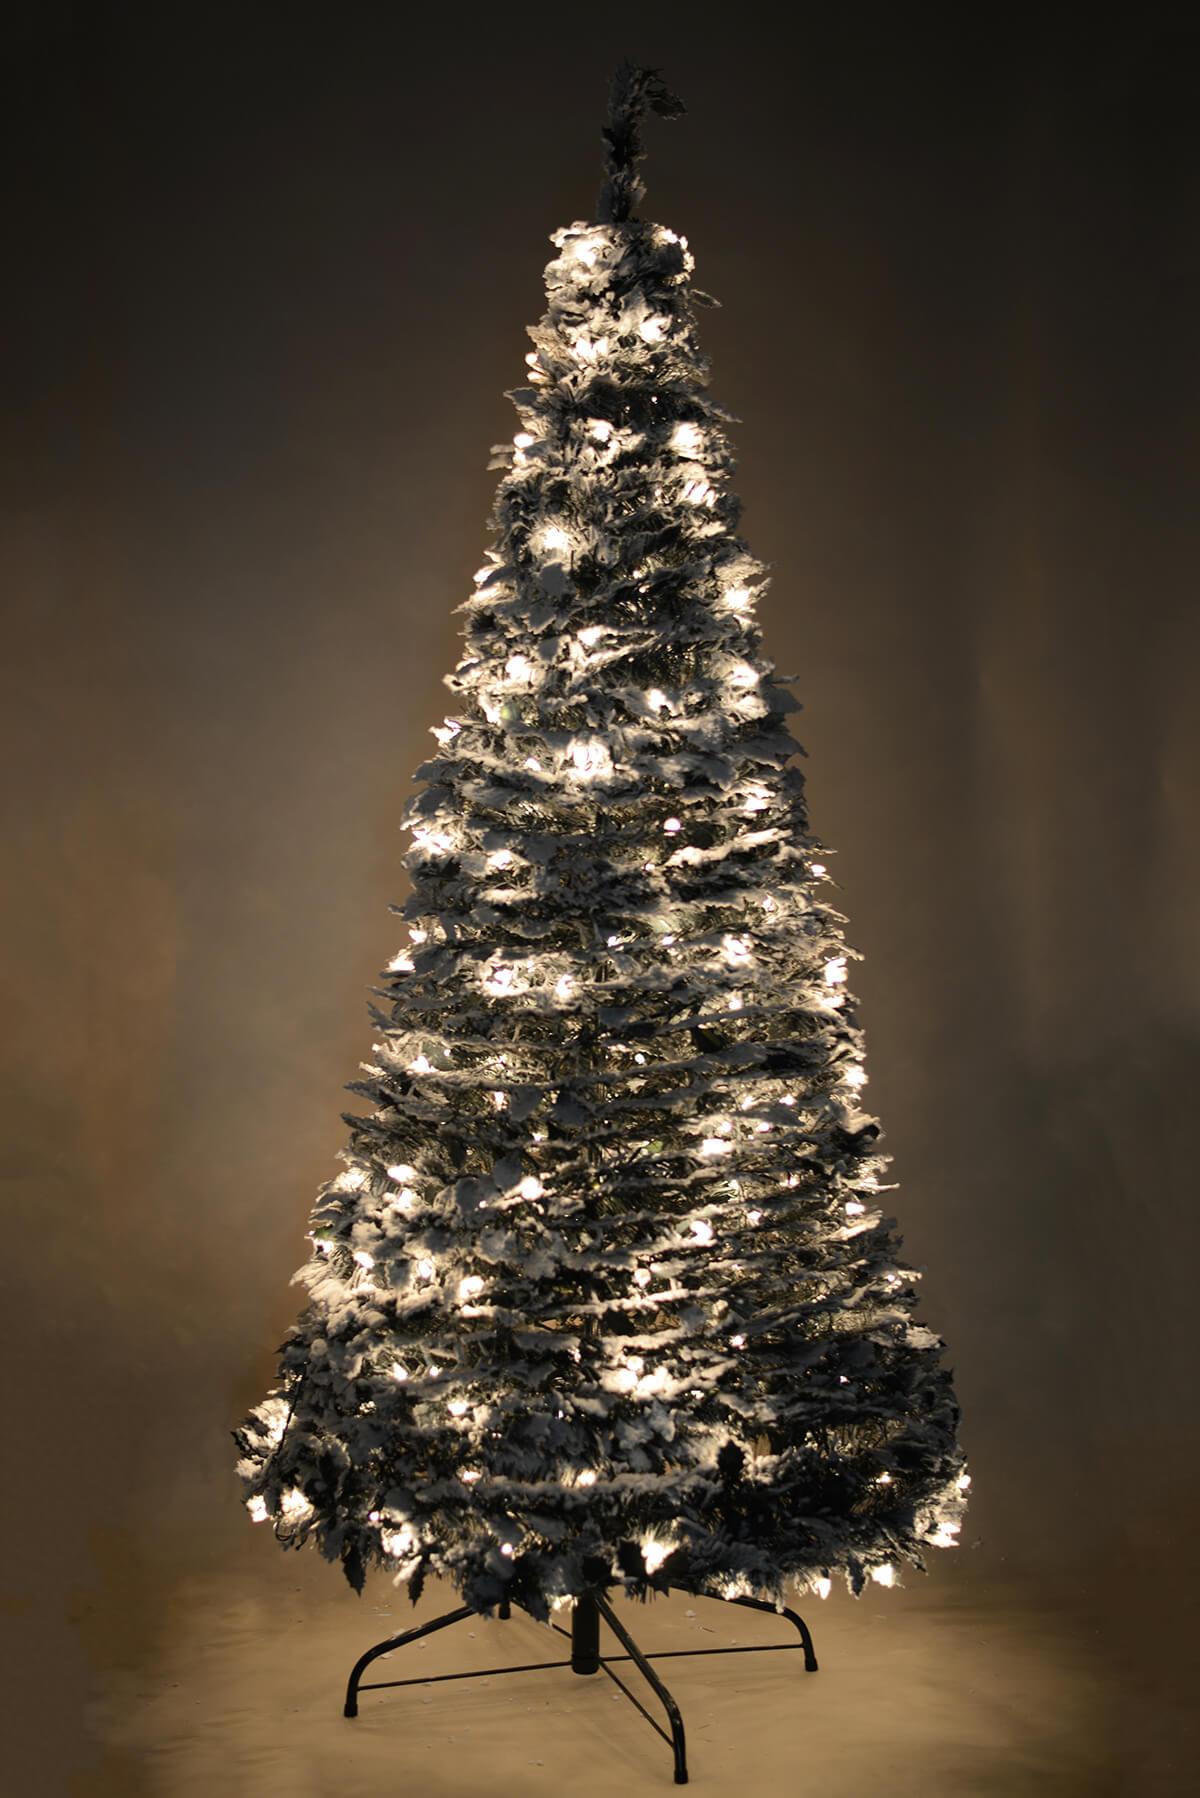 six foot accordion christmas tree snow covered with lights - Snow Covered Christmas Trees